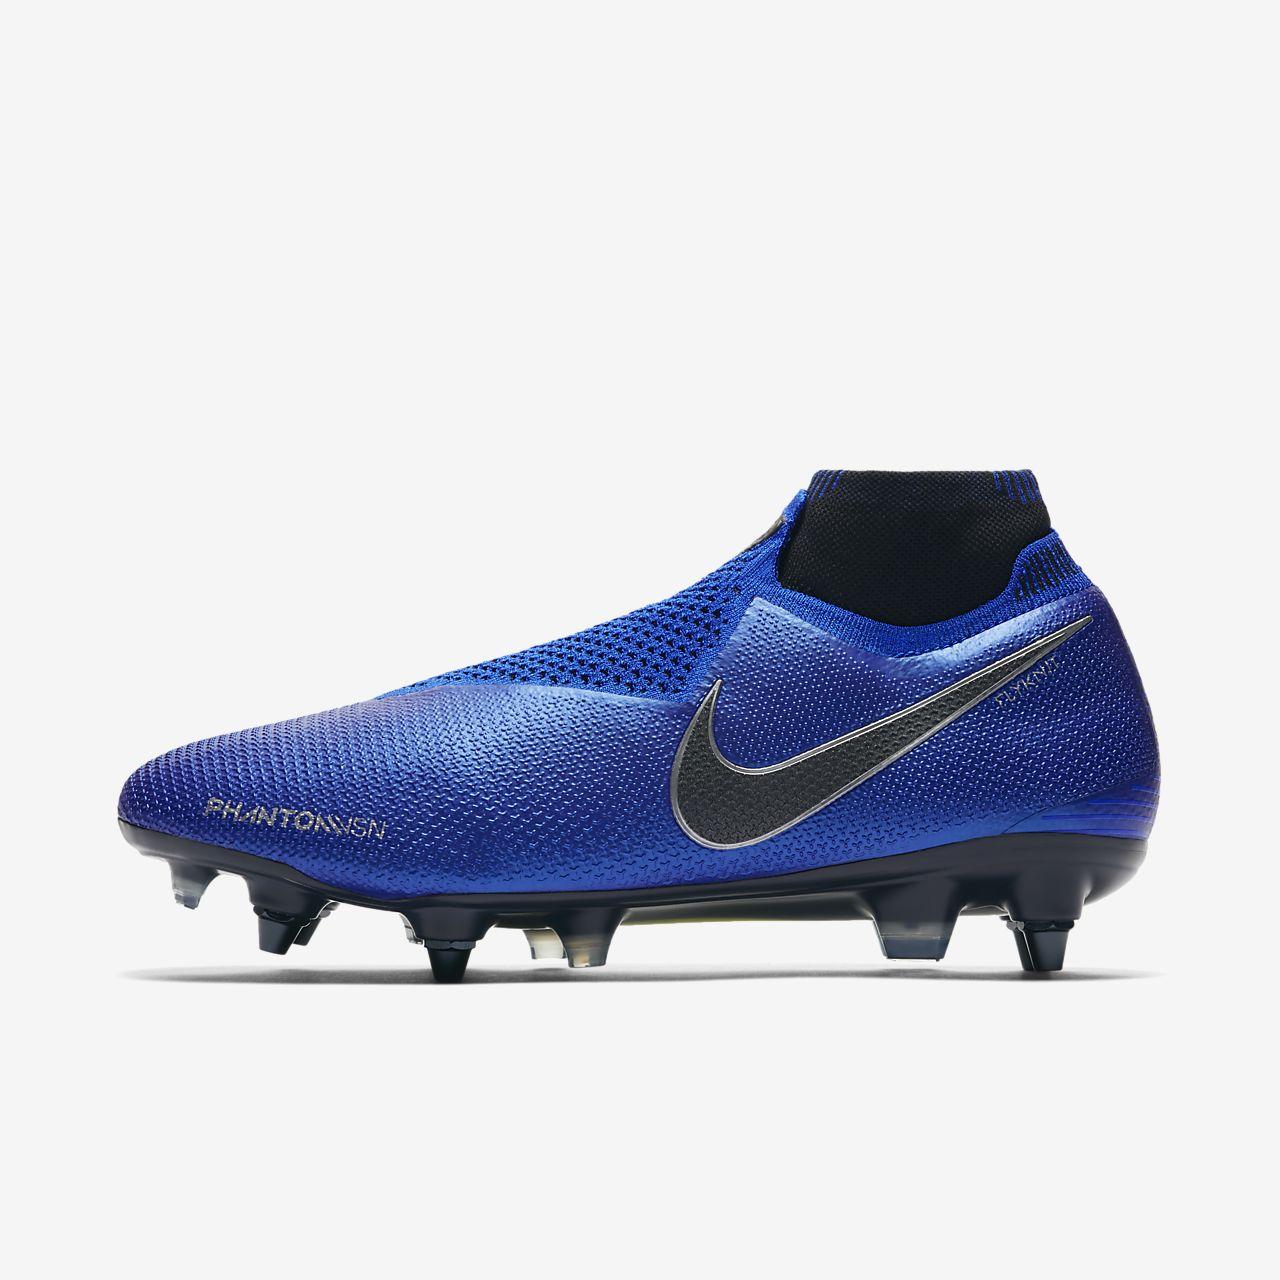 bfcf6042be83a ... Nike Phantom Vision Elite Dynamic Fit Anti-Clog SG-PRO Botas de fútbol